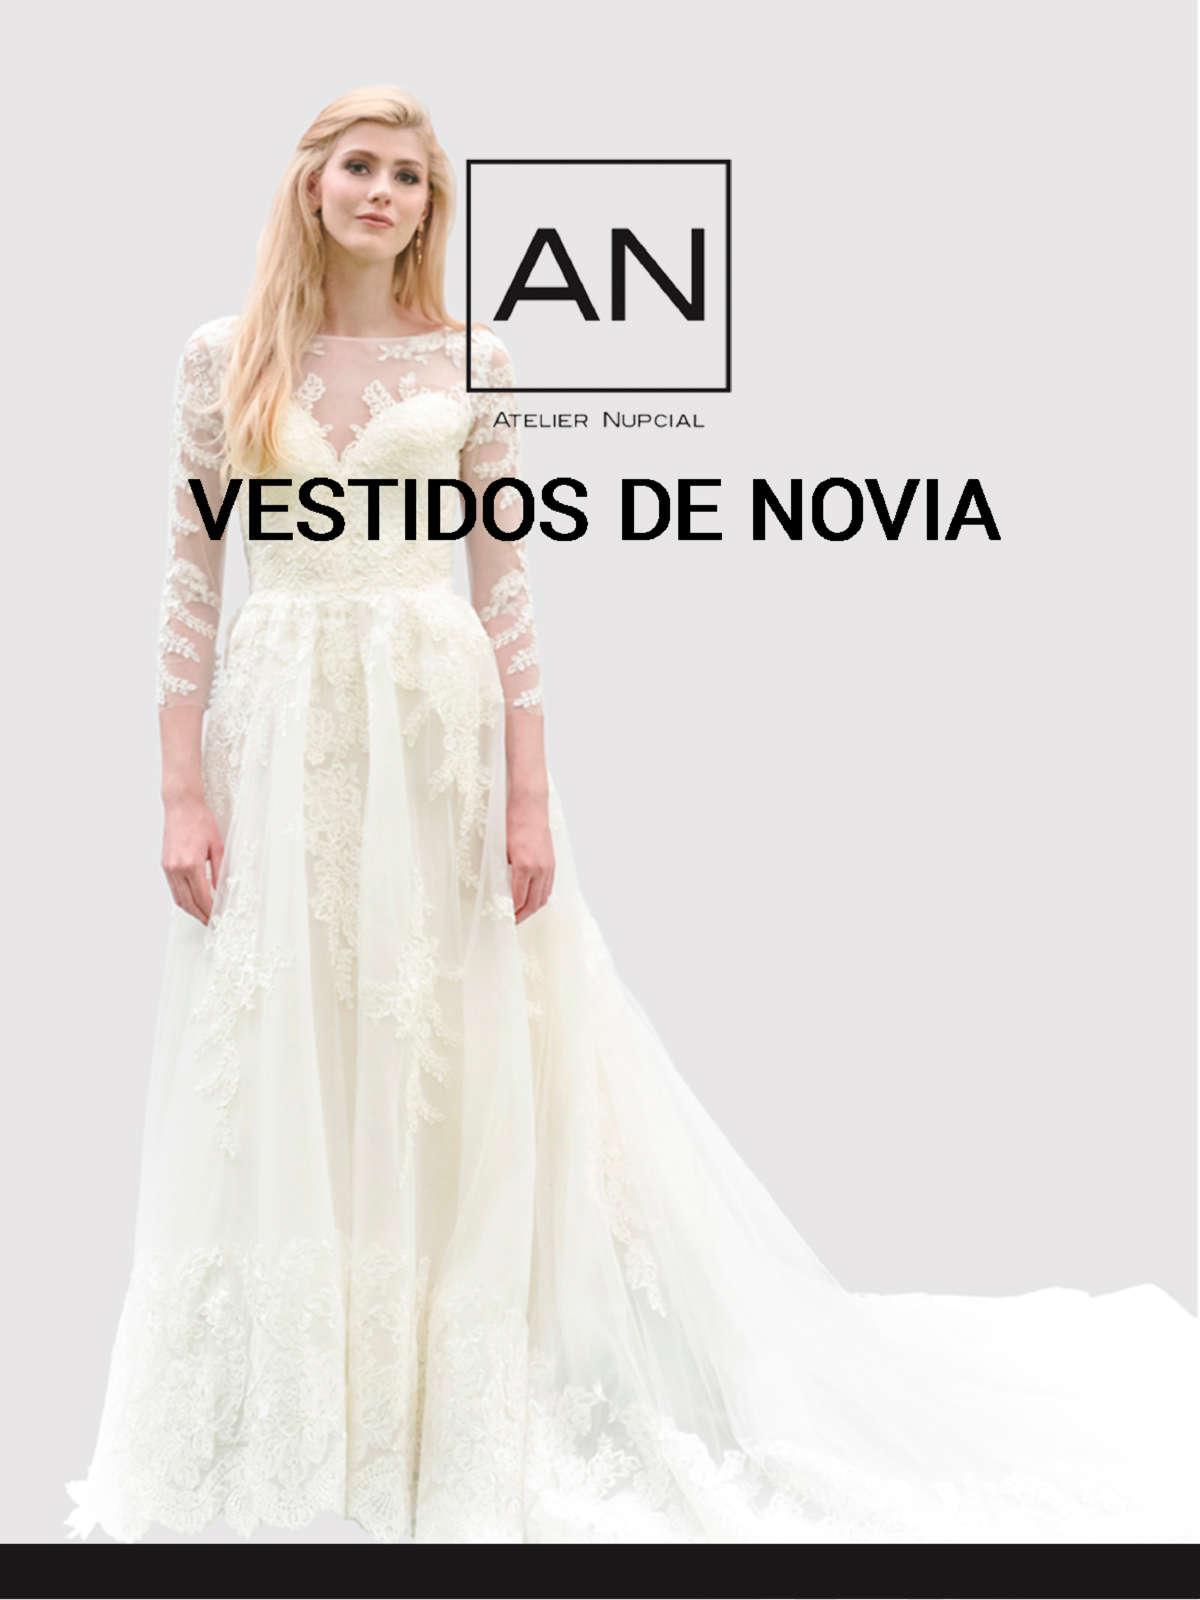 d6585f5f36 Velos de novia en Santiago Tepatlaxco - Catálogos